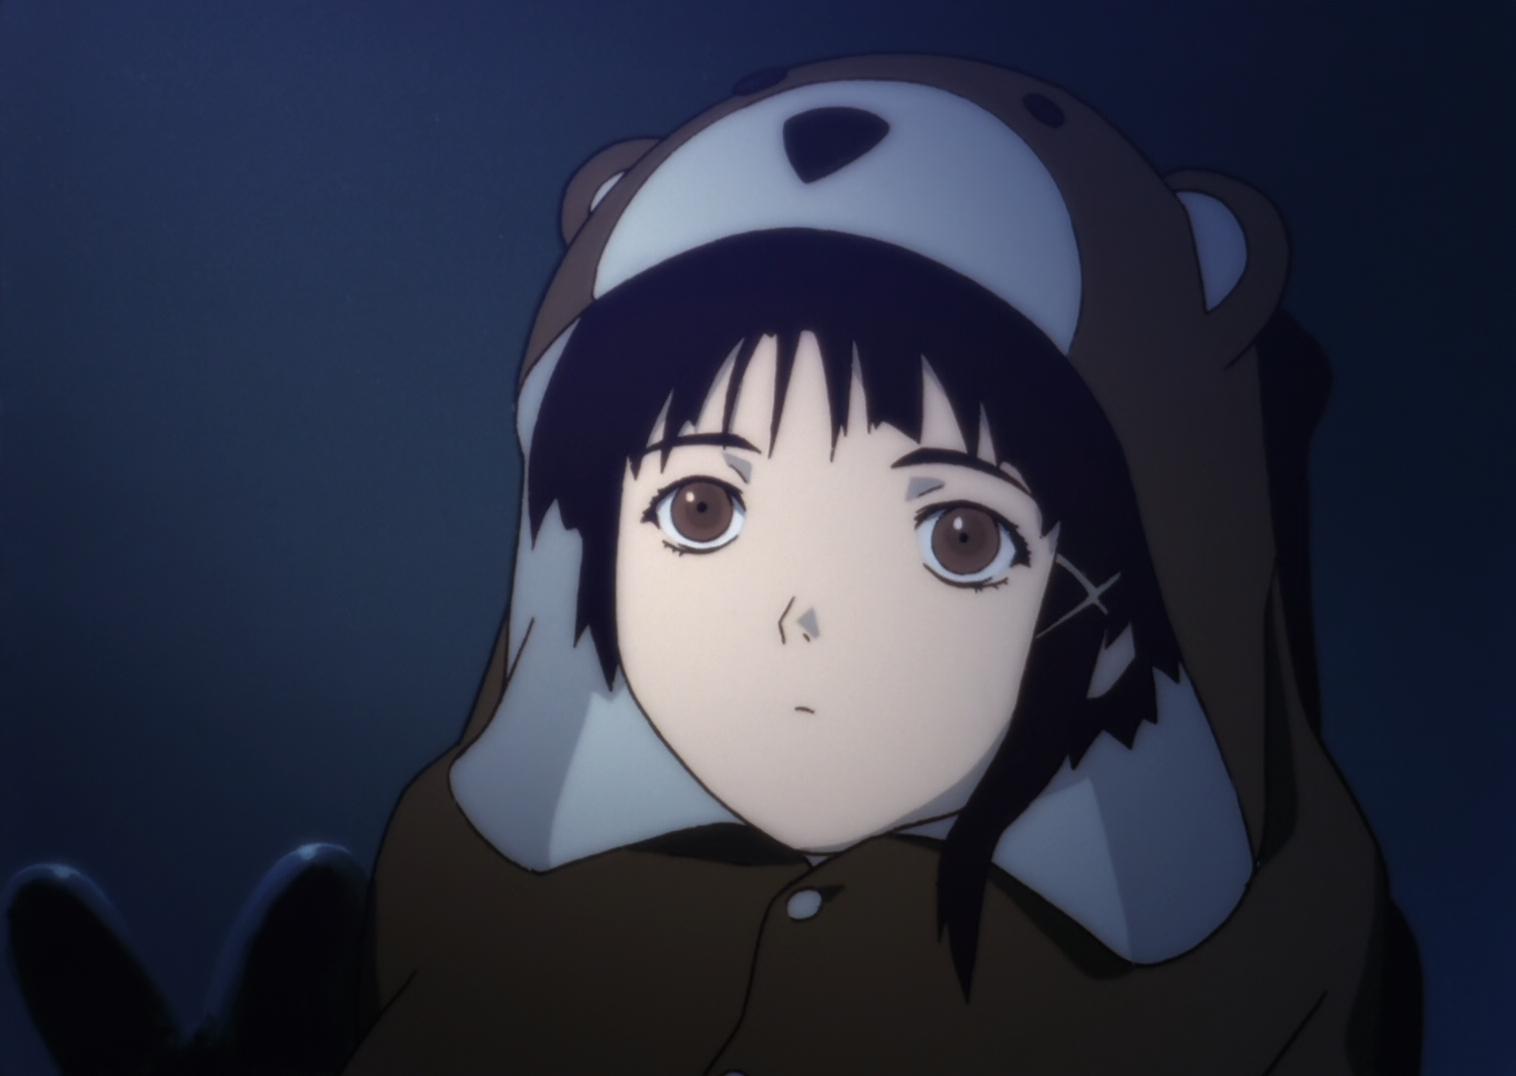 Top 10 School Anime With an OP MC who has Magic Powers